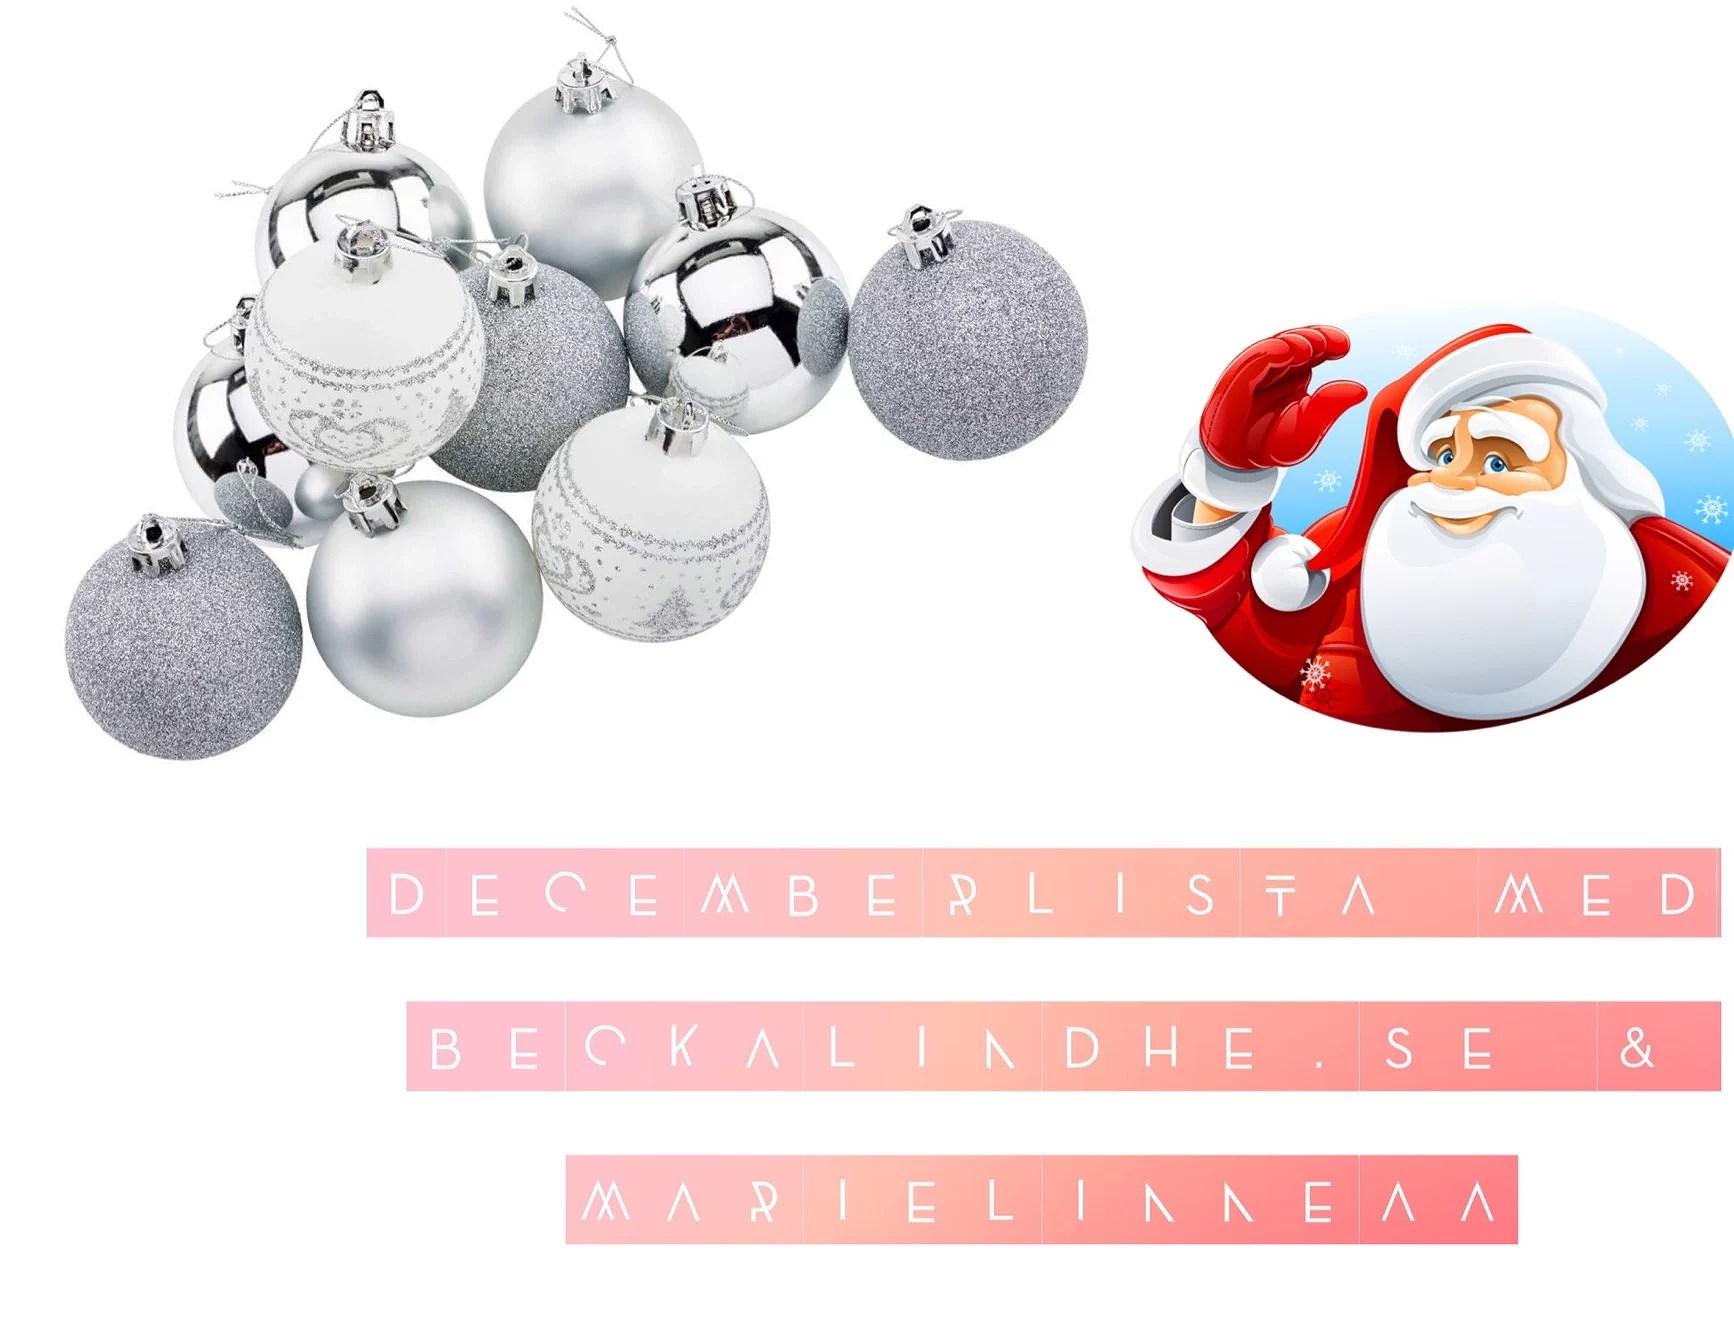 Decemberlista dag 9